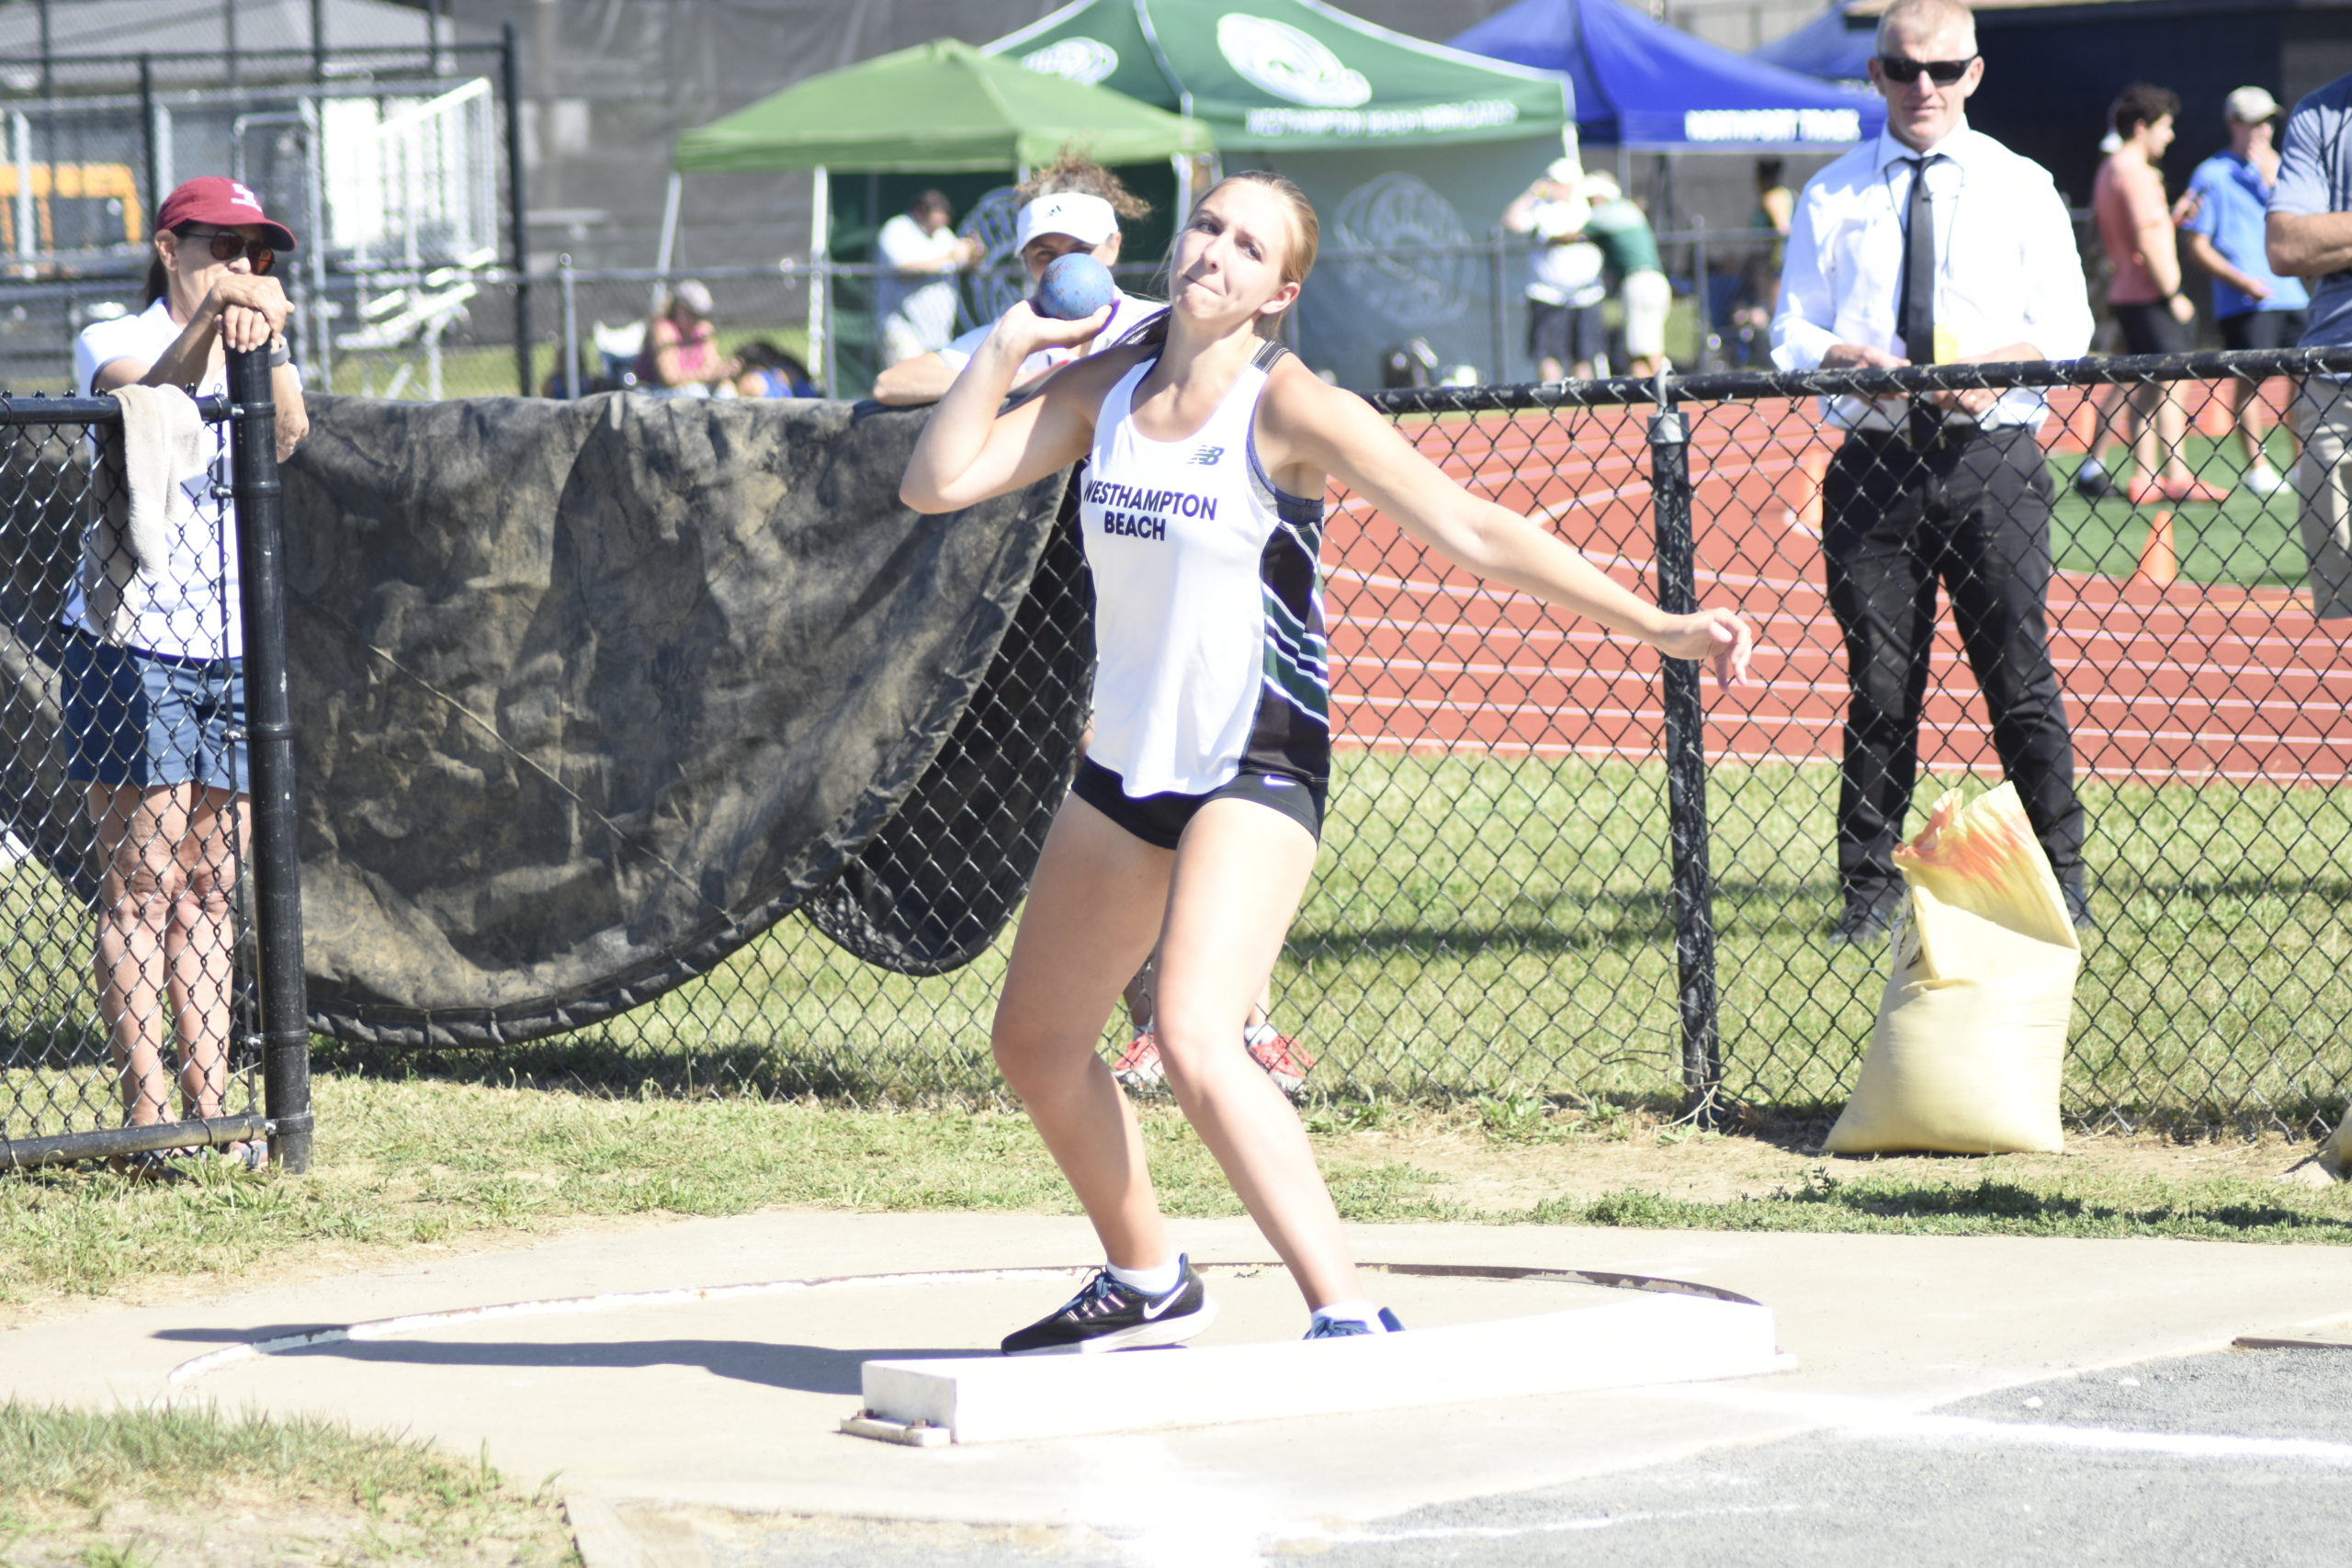 Westhampton Beach freshman Madison Phillips competing in the shot put portion of the pentathlon.